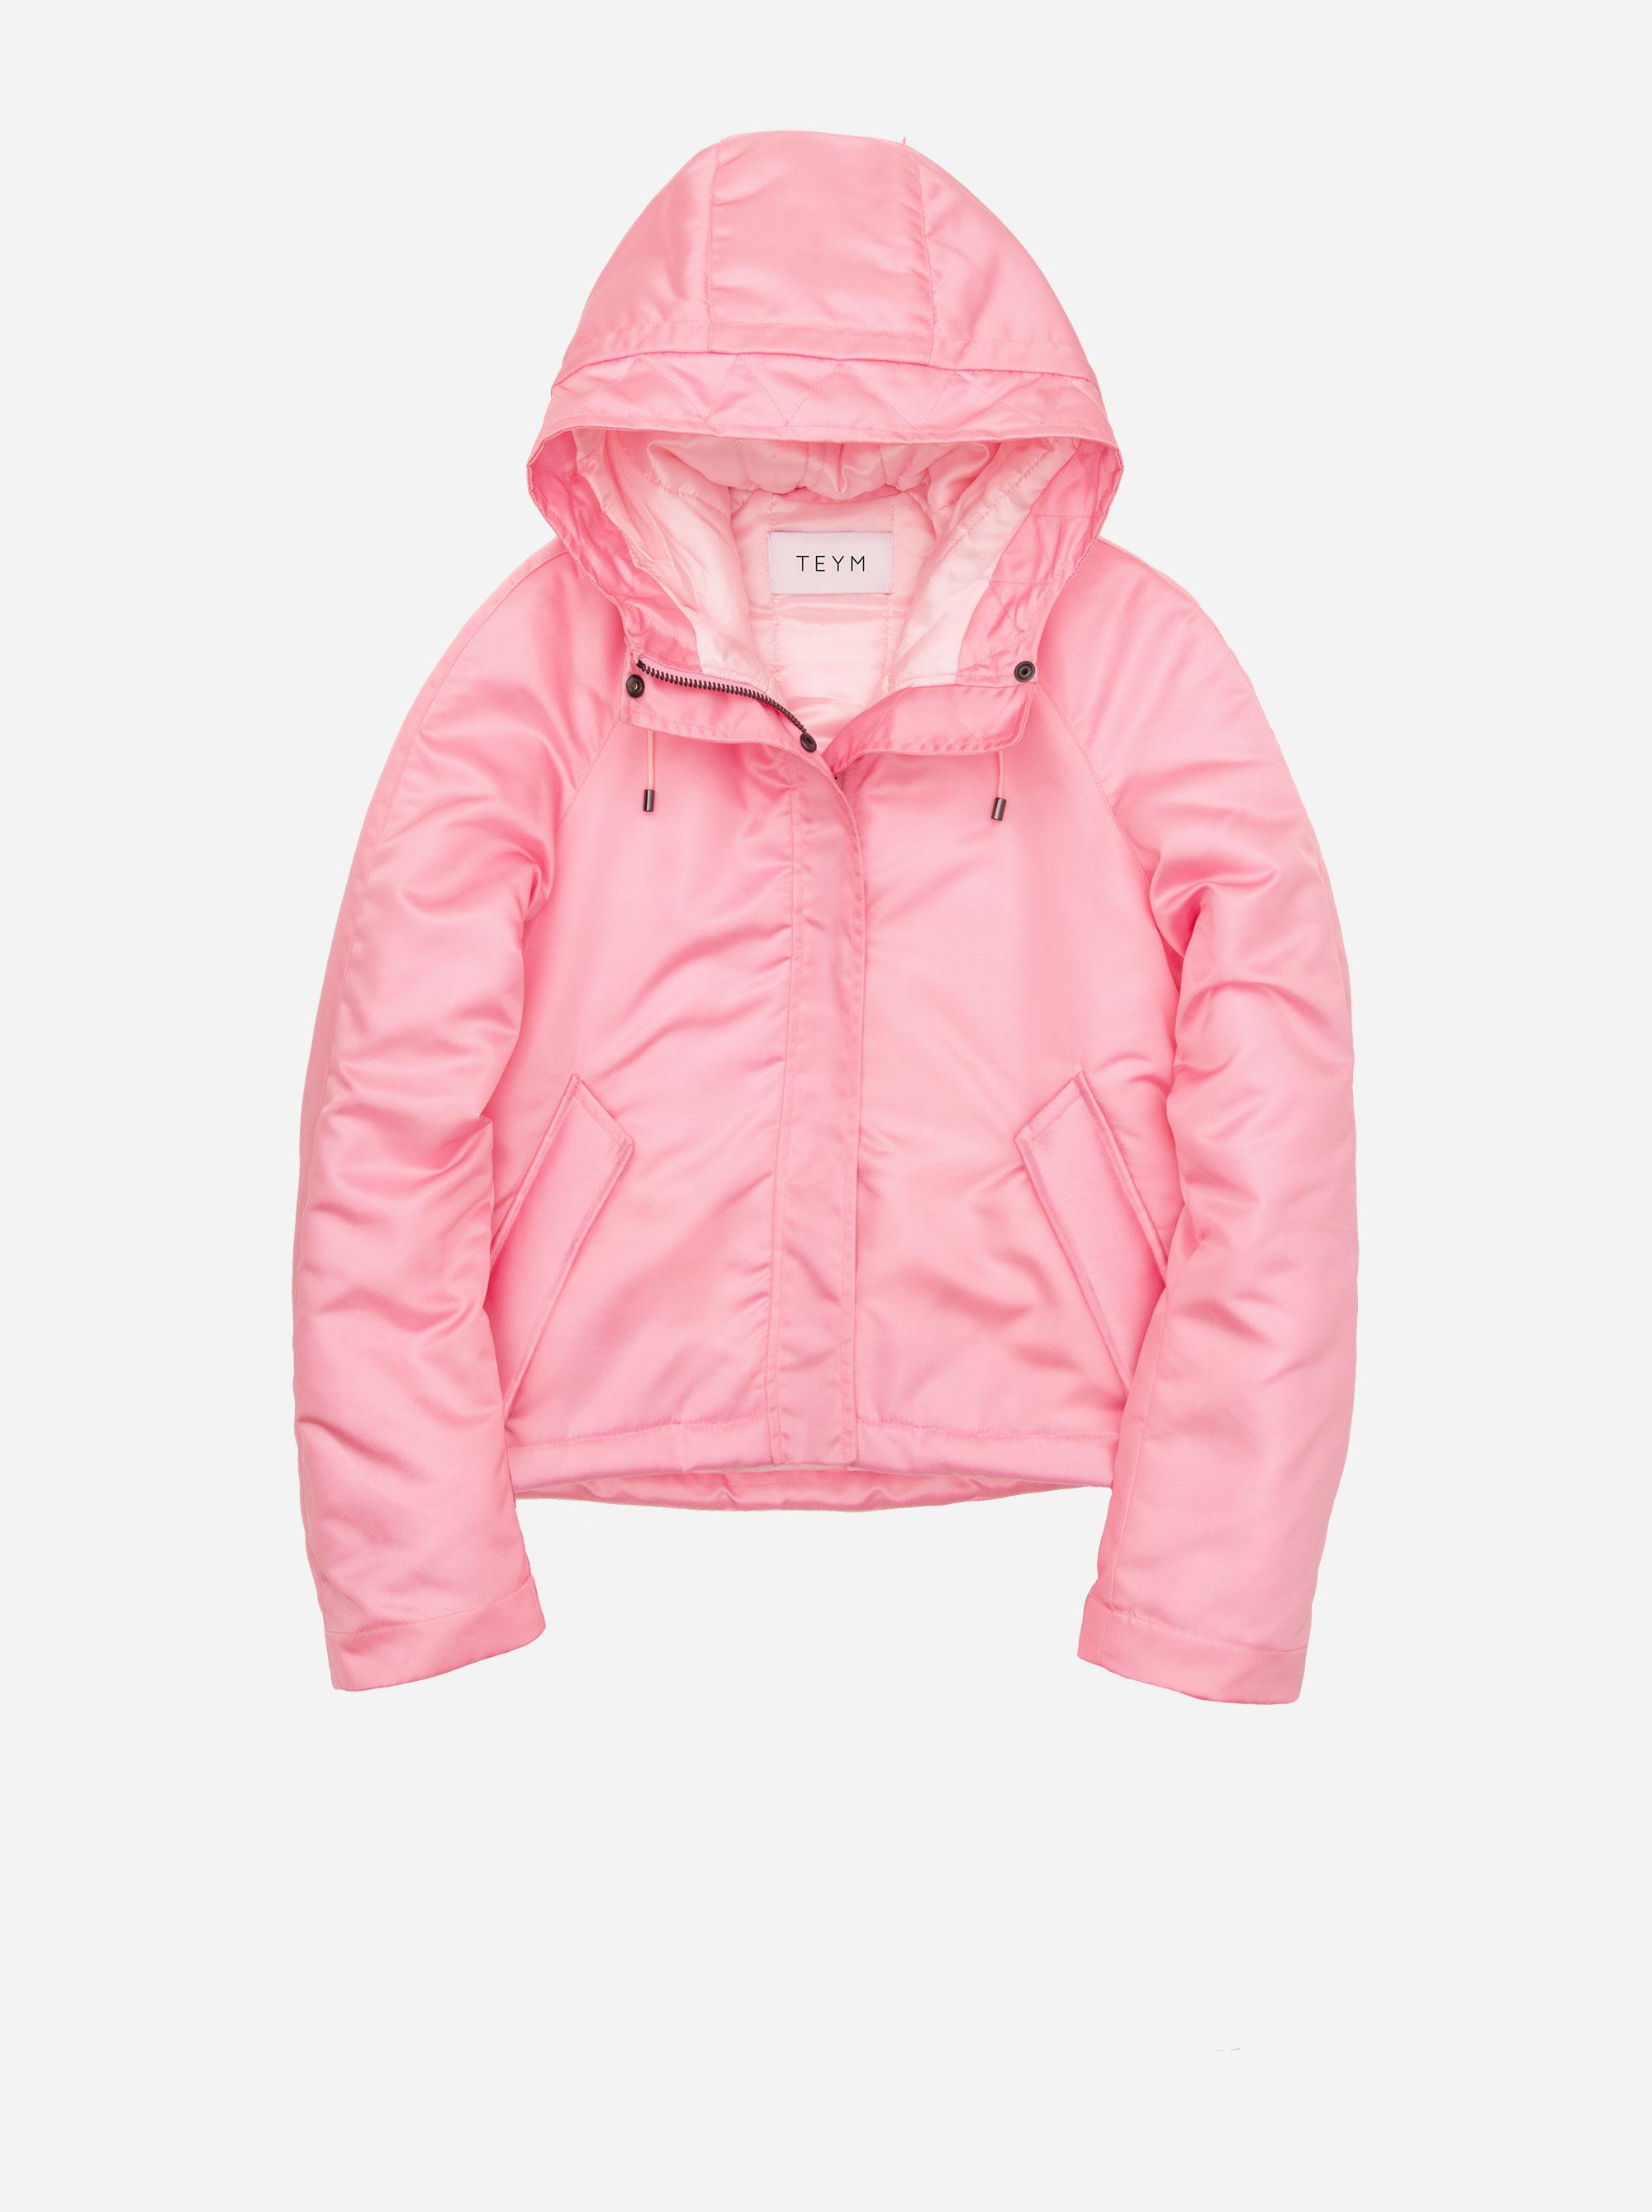 Teym - The Parka - Women - Pink - Short - 7